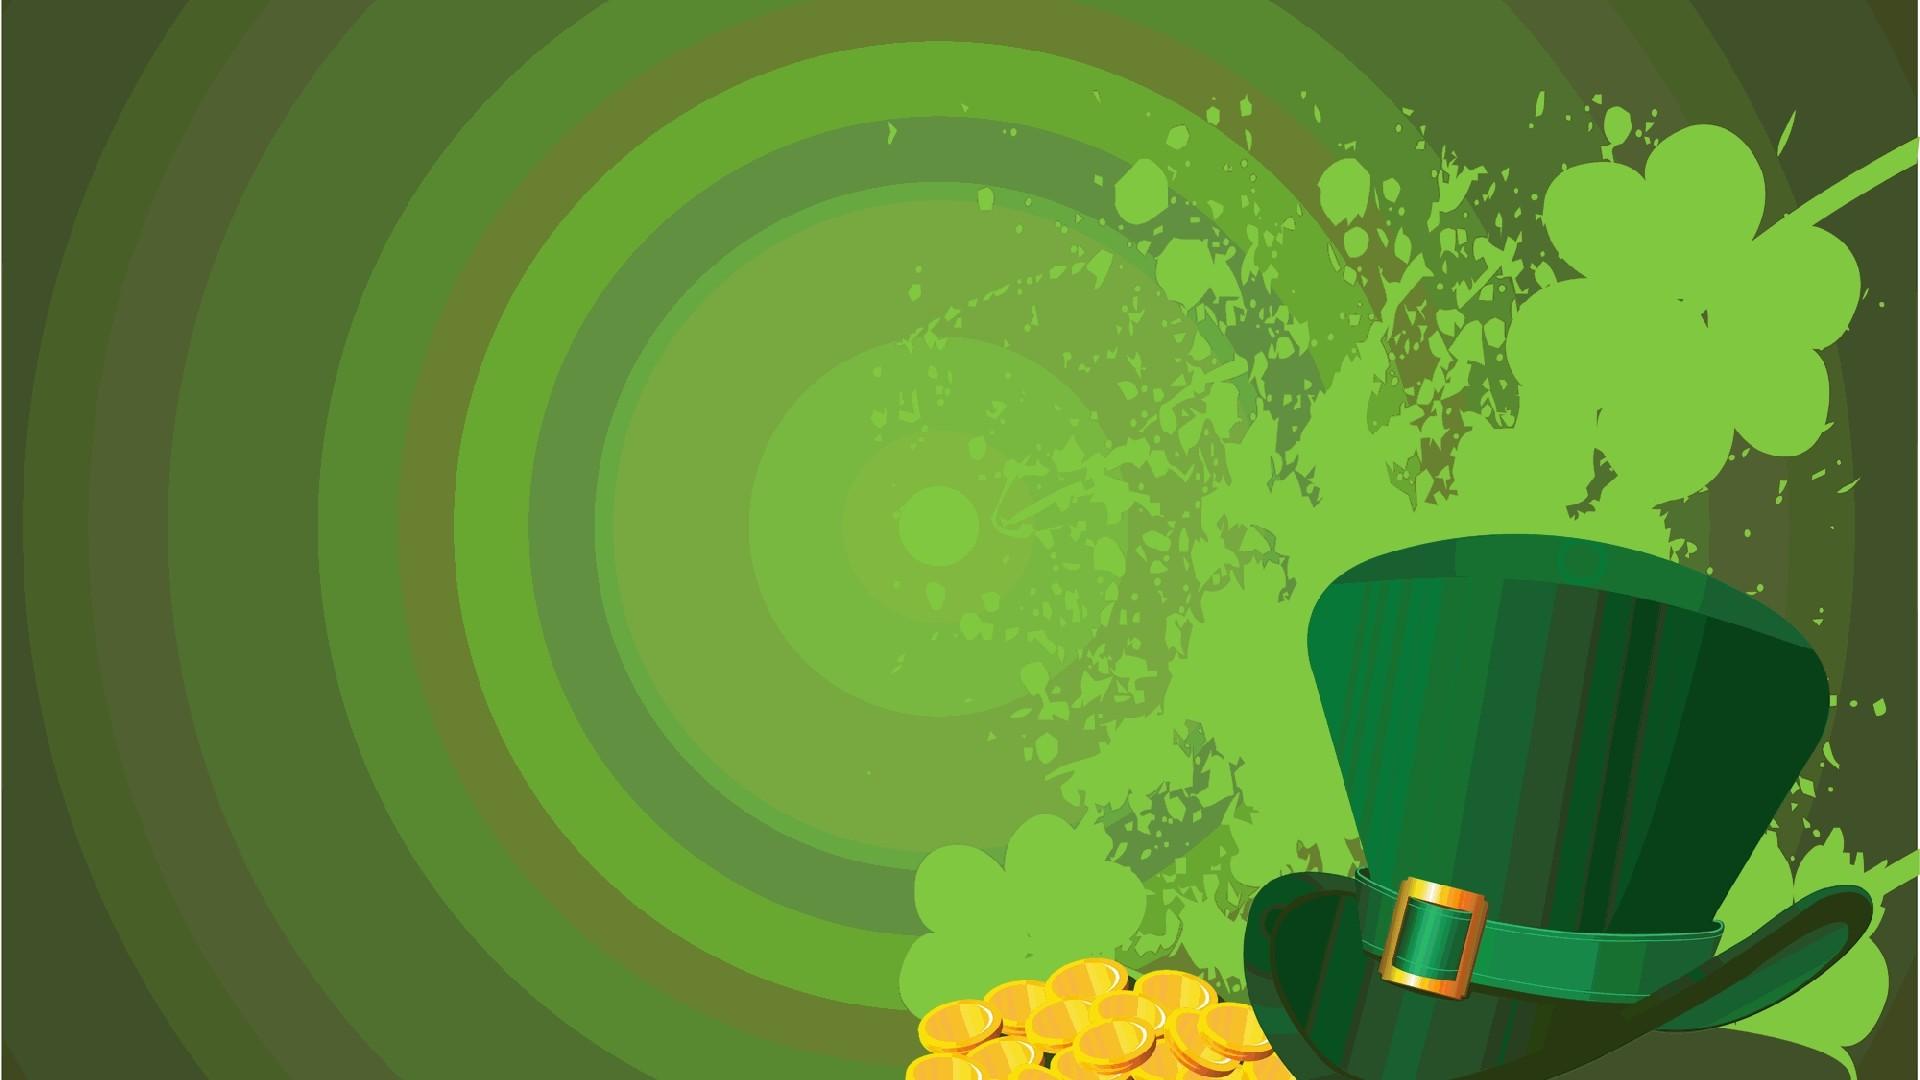 St. Patrick's Day 2021 HD Wallpaper